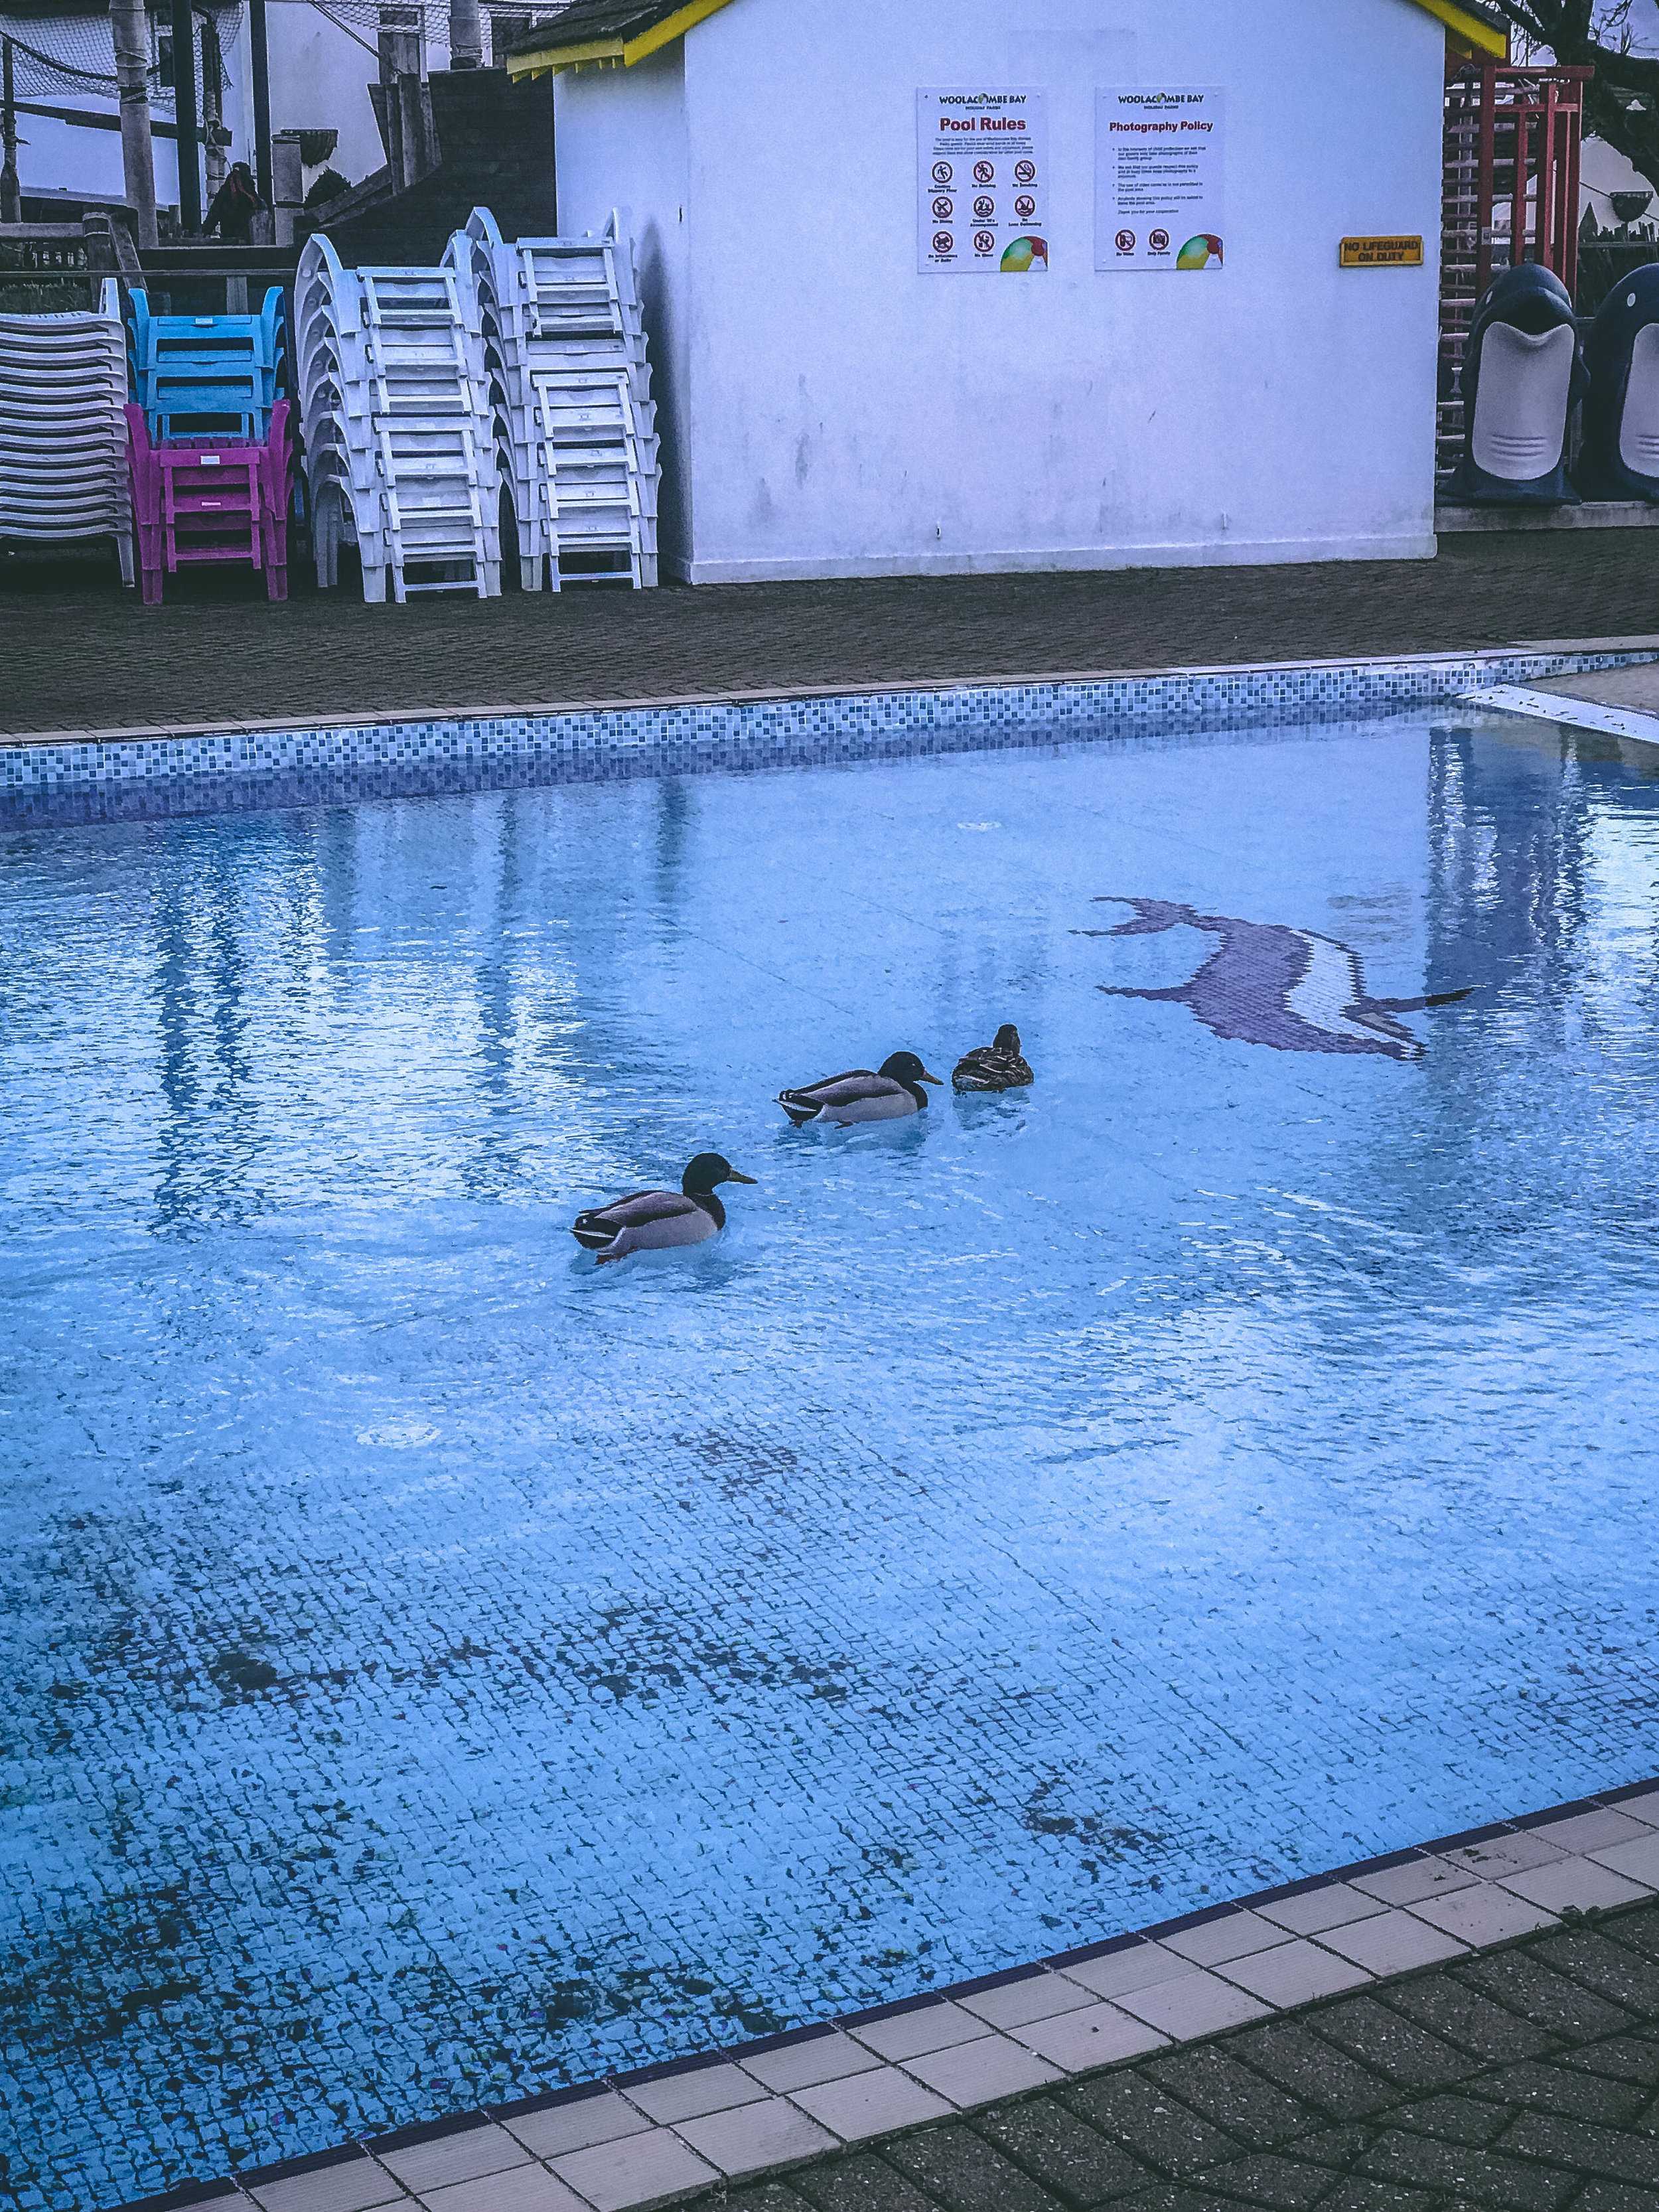 Ducks Woolacombe.jpg